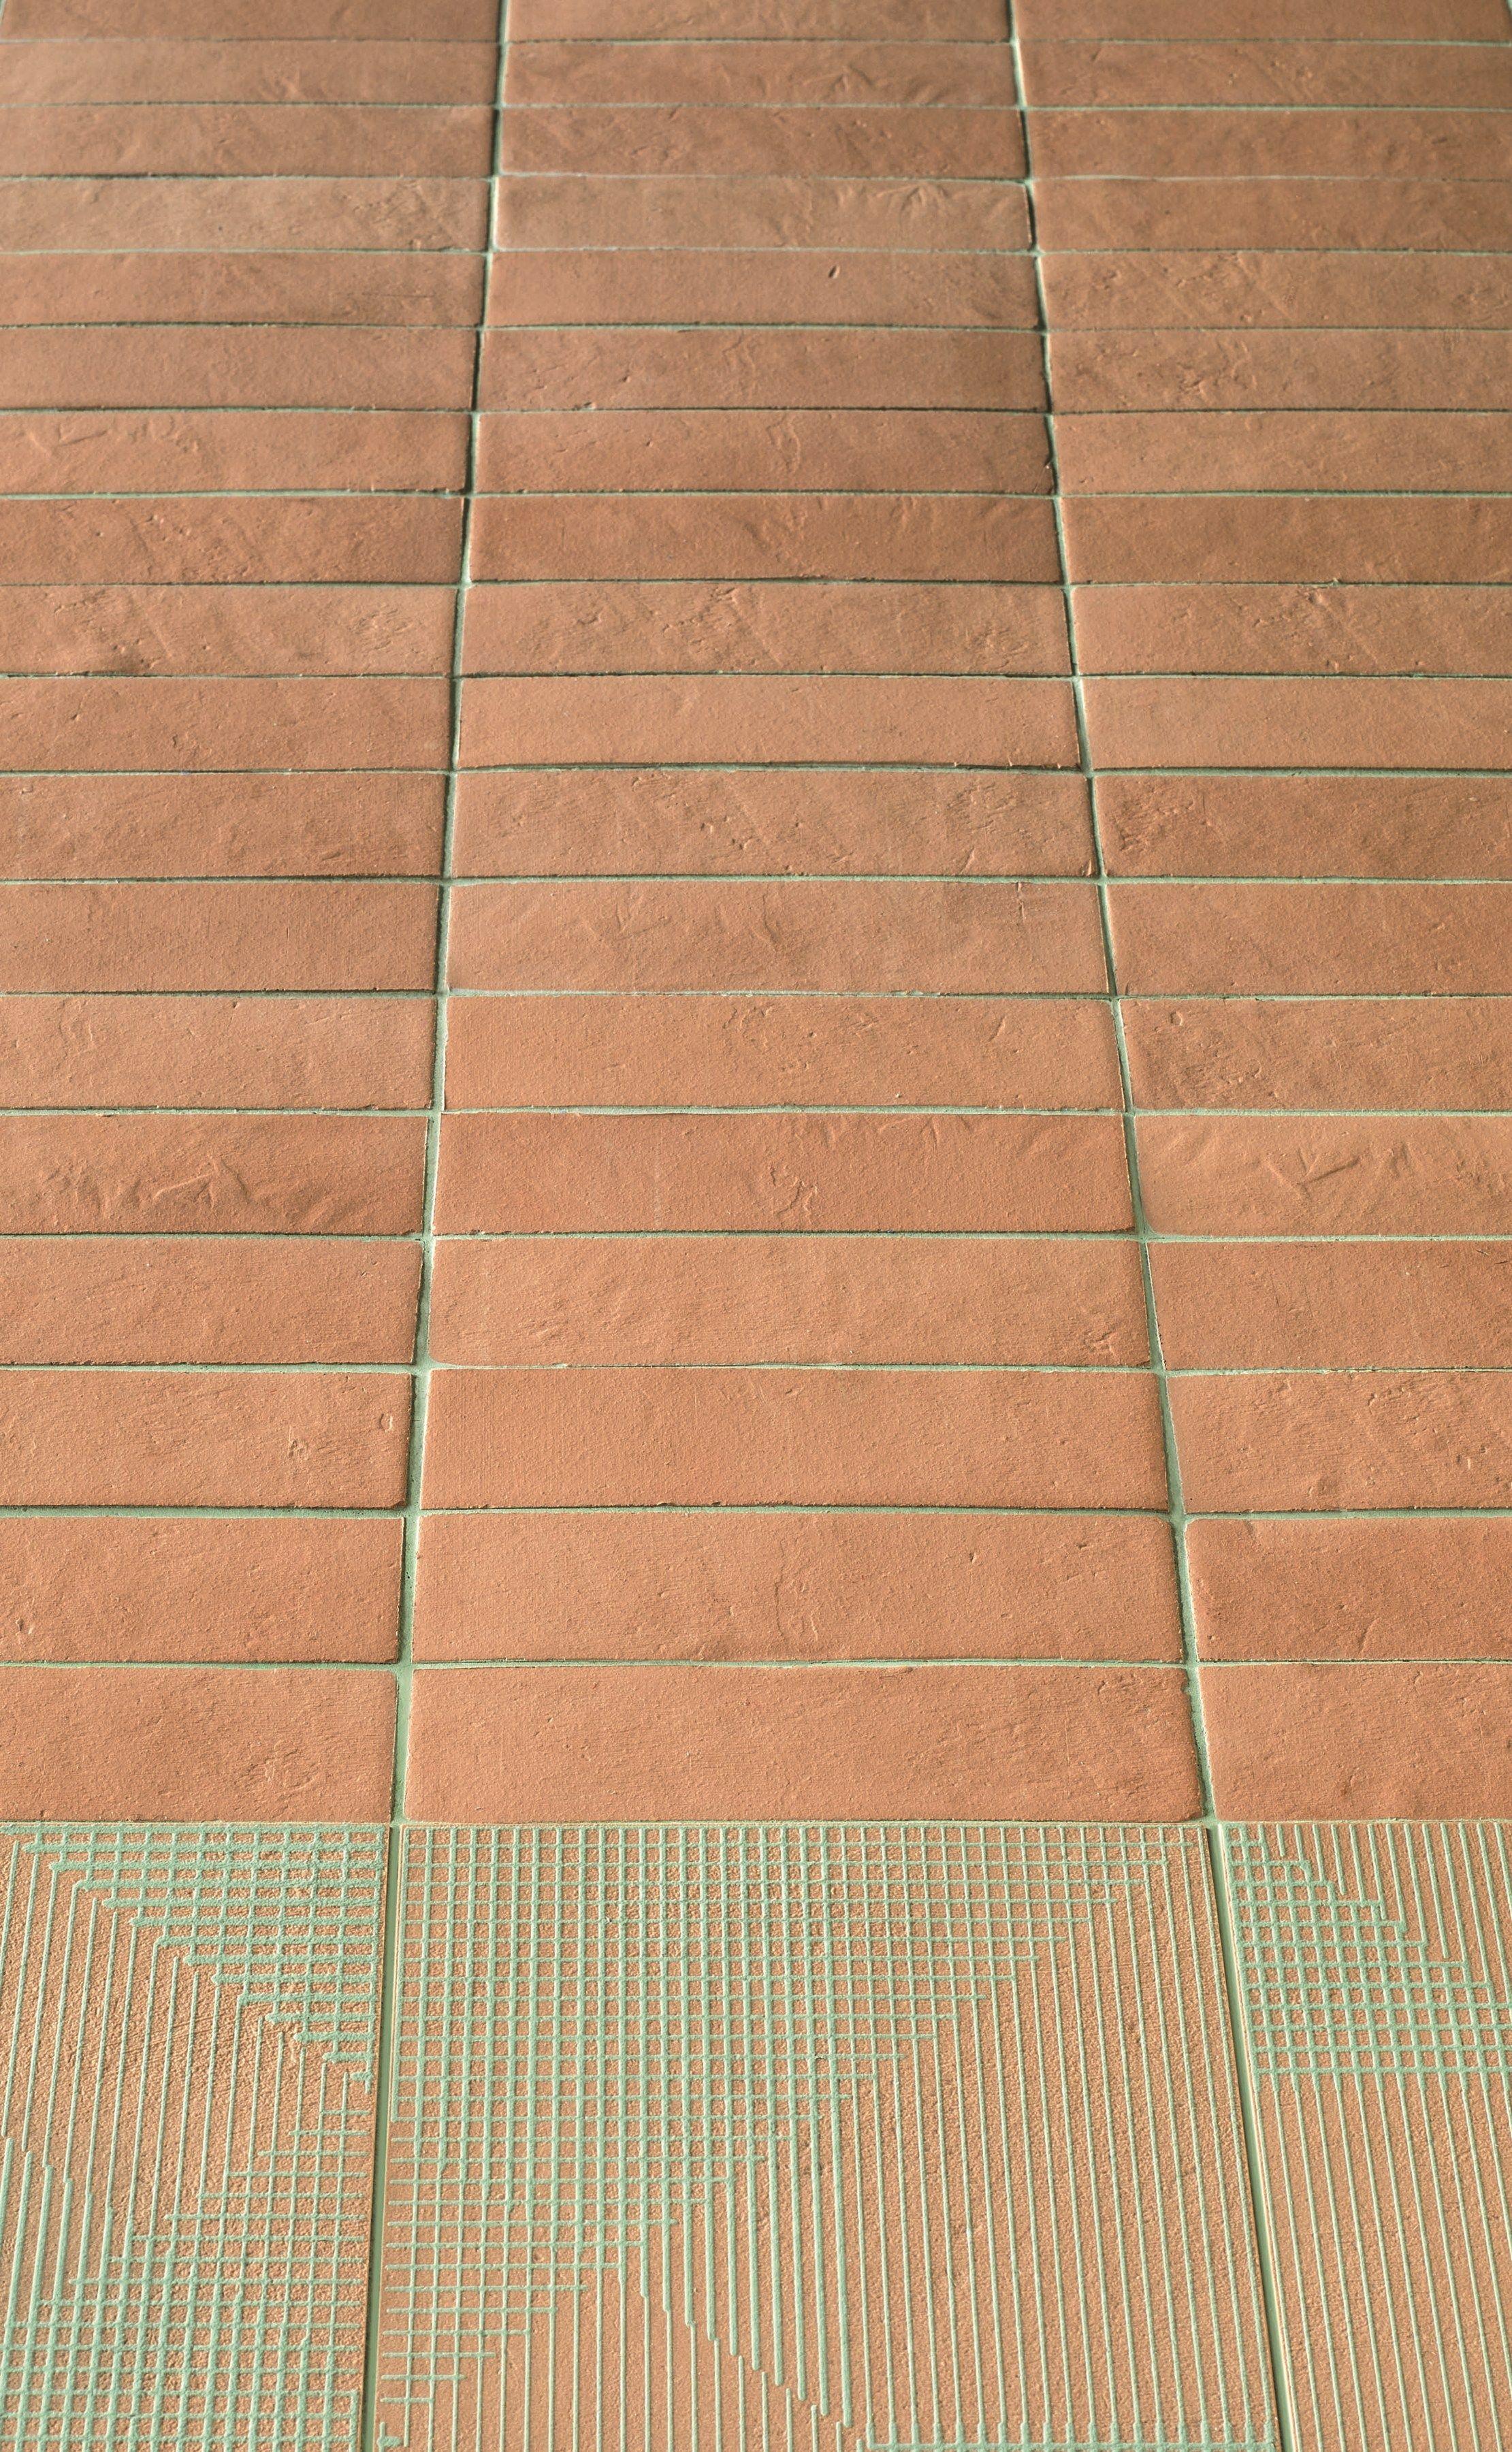 Porcelain stoneware wallfloor tiles tierras industrial frame blush porcelain stoneware wallfloor tiles tierras industrial frame blush by mutina design patricia urquiola dailygadgetfo Images